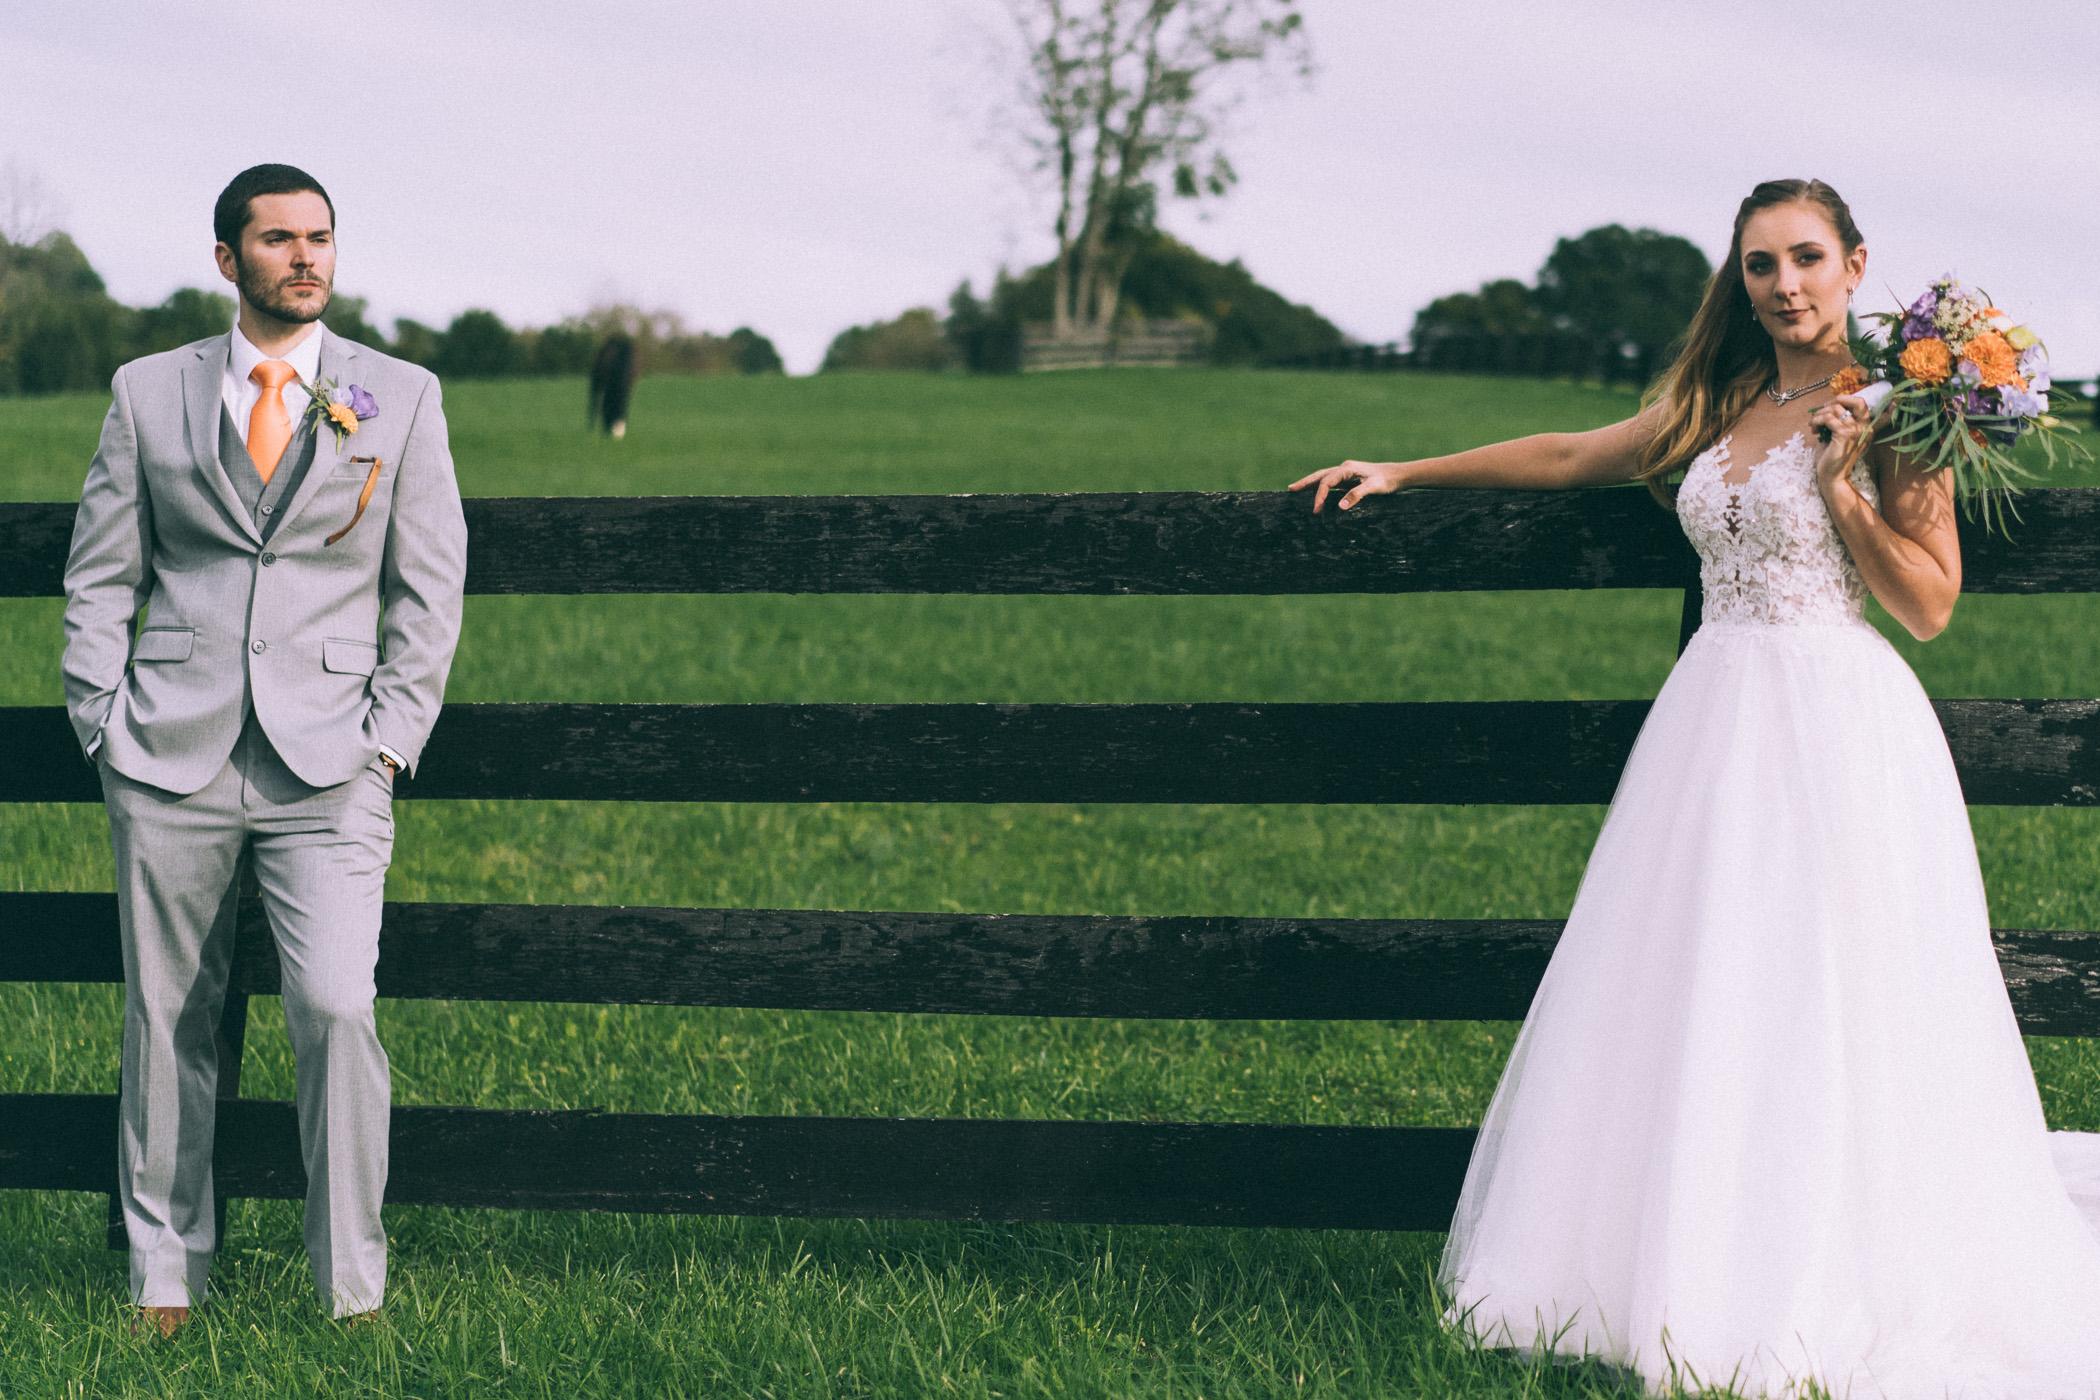 18-Faux Wedding-brandon shane warren-231.jpg